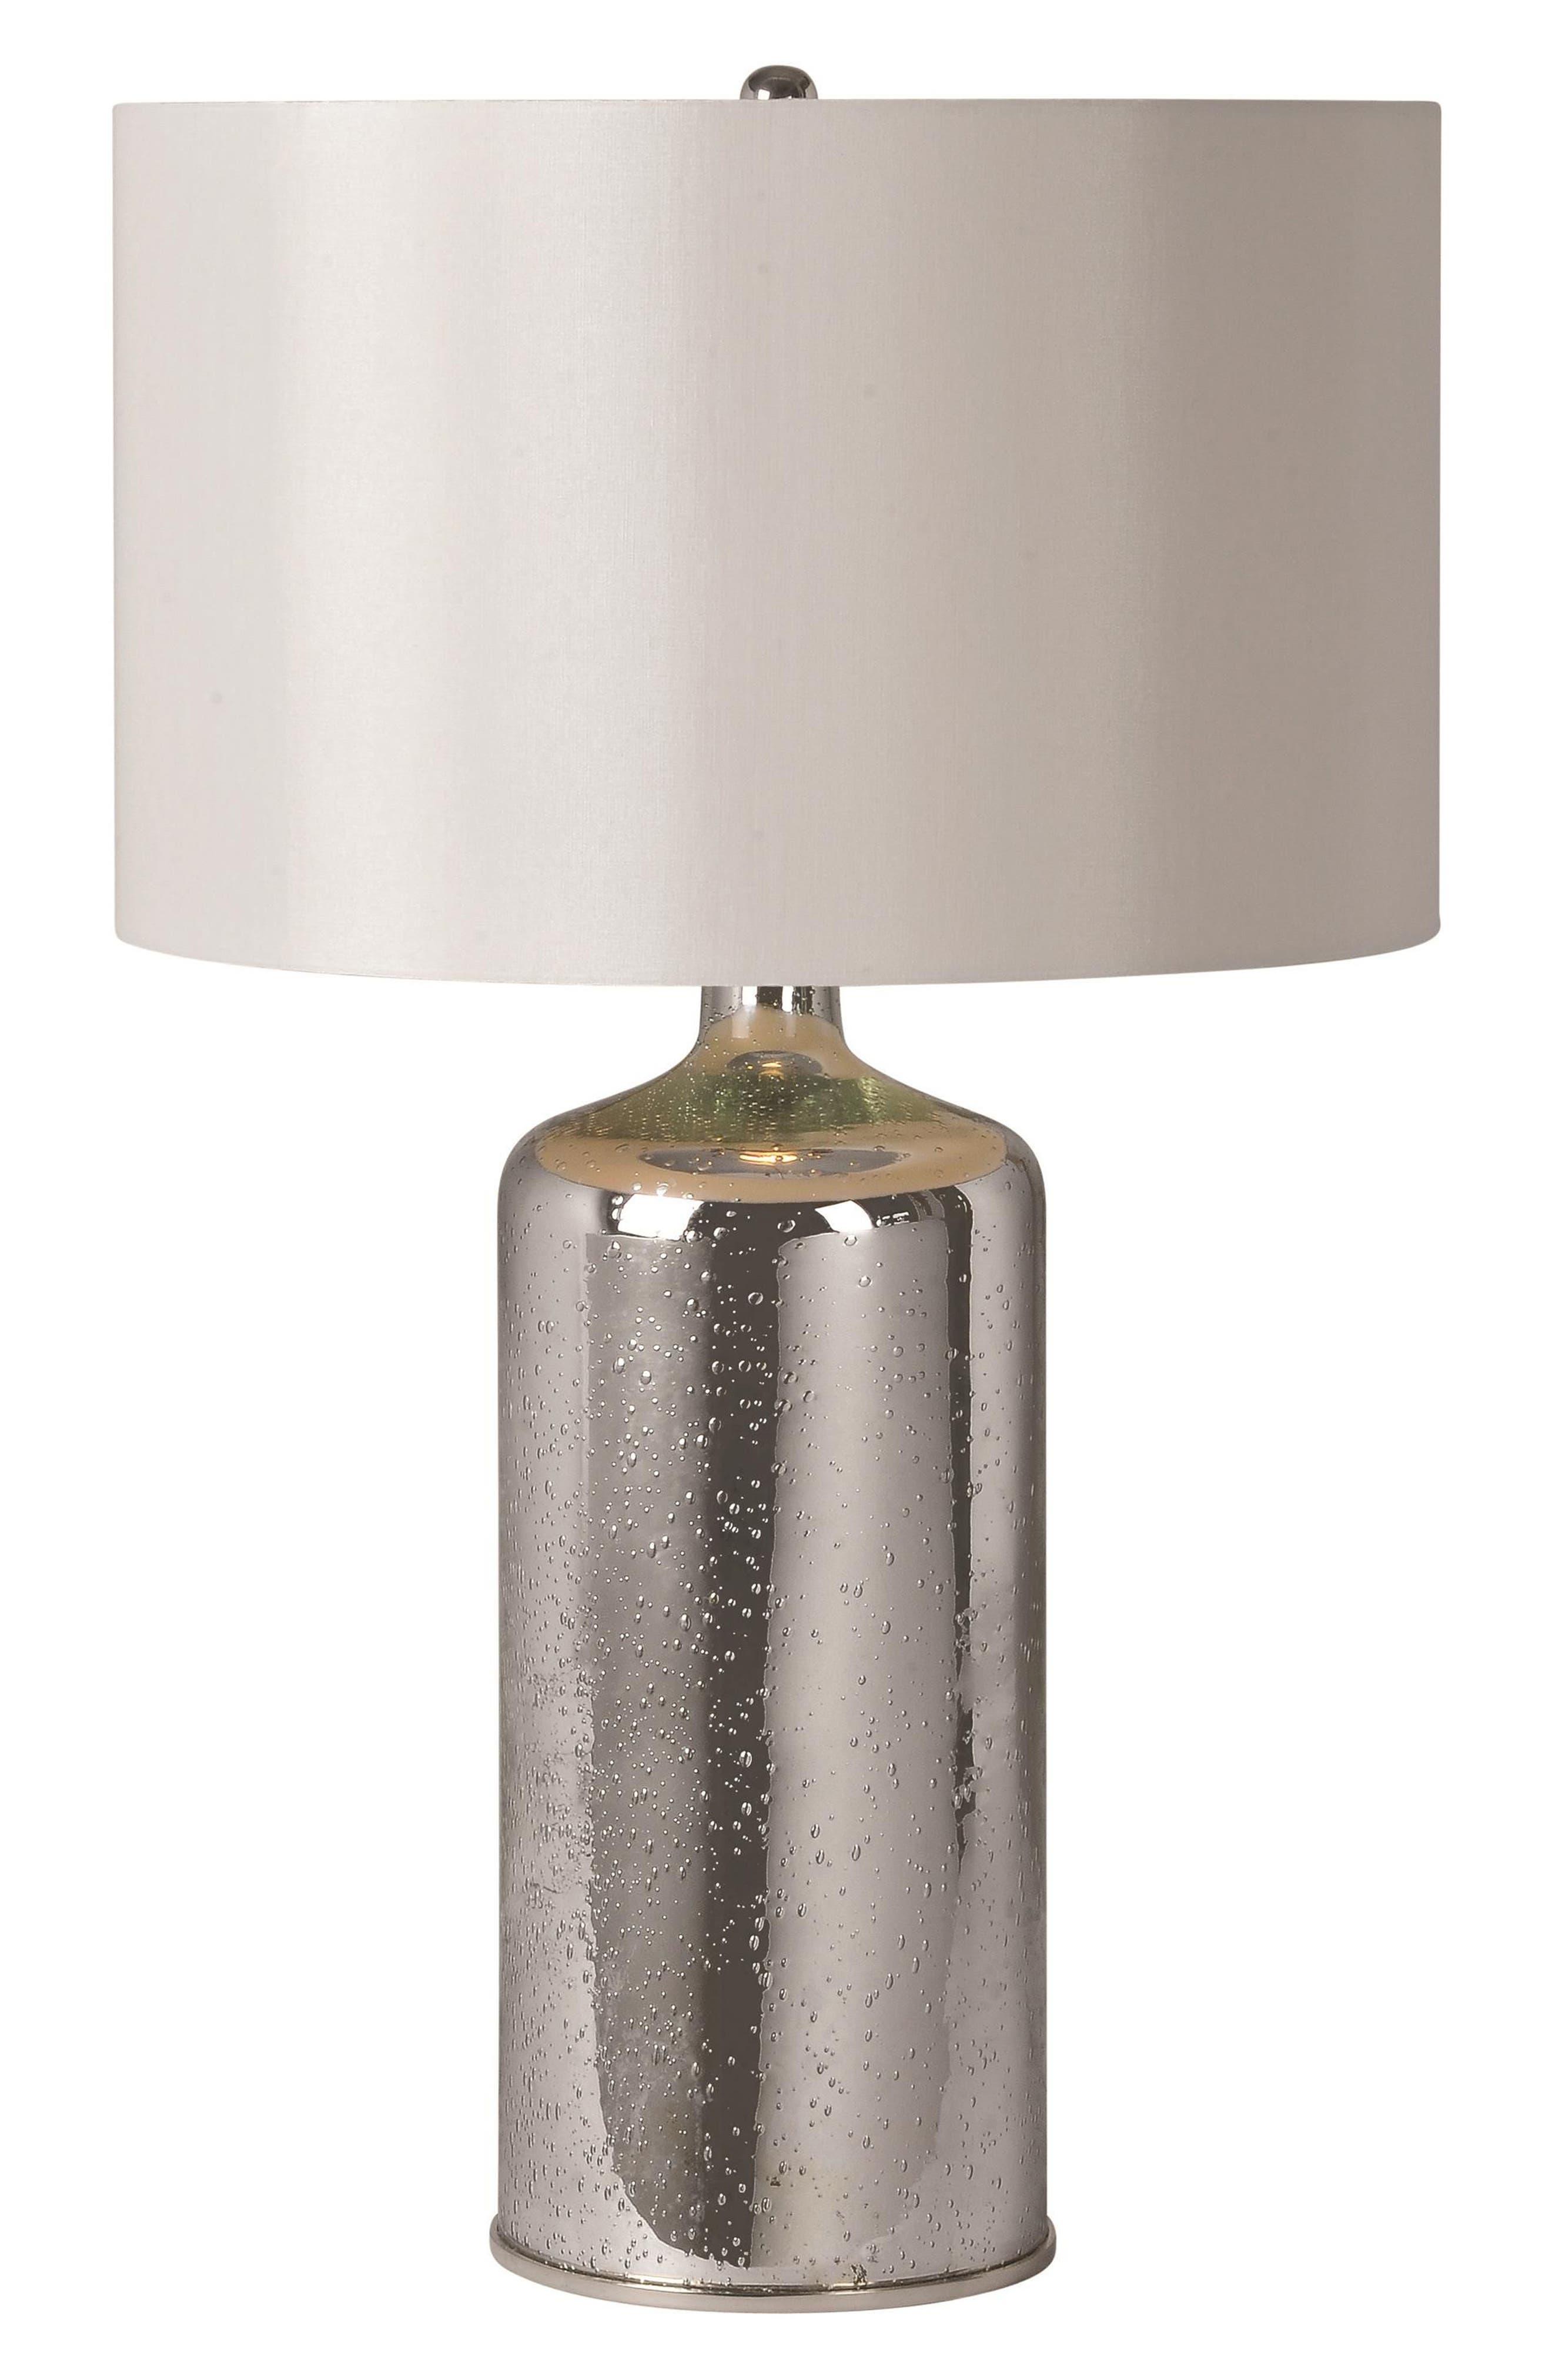 Rita Table Lamp,                         Main,                         color, Silver Plated